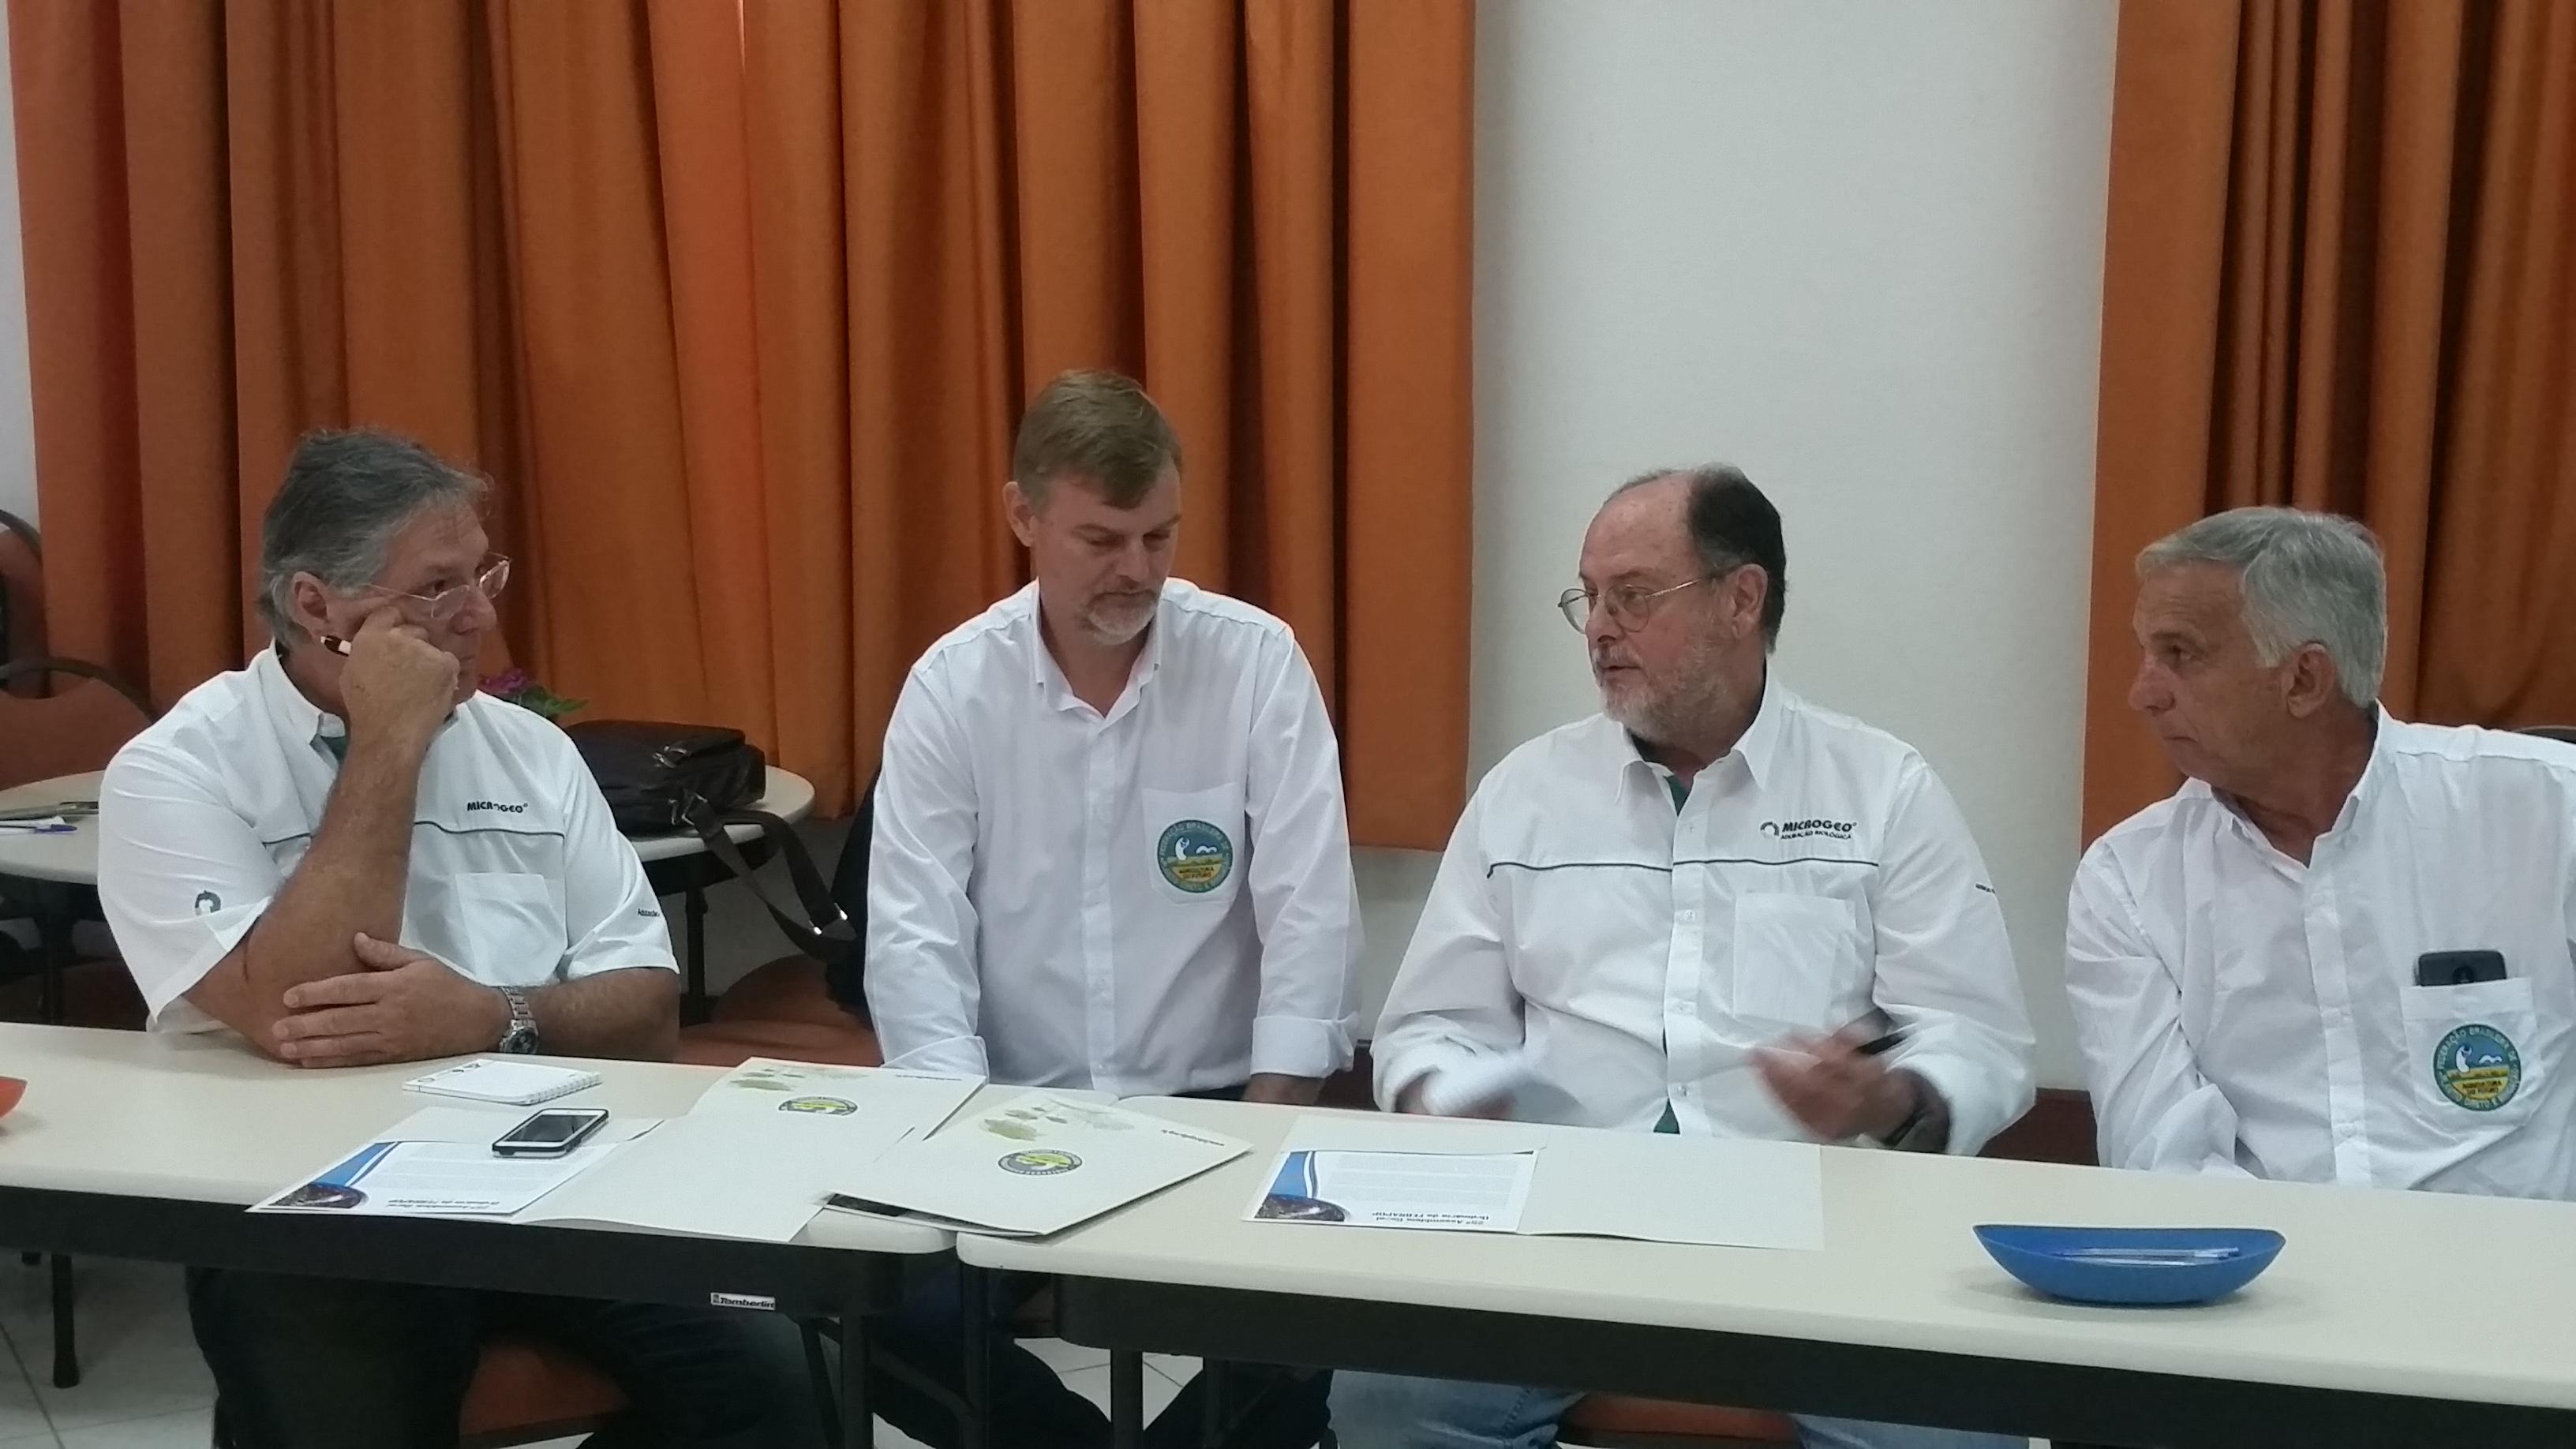 Jairo Pegoraro (Microgeo), Alfonso Sleutjes, Paulo D´Andréa (Microgeo) e Lucio Damalia